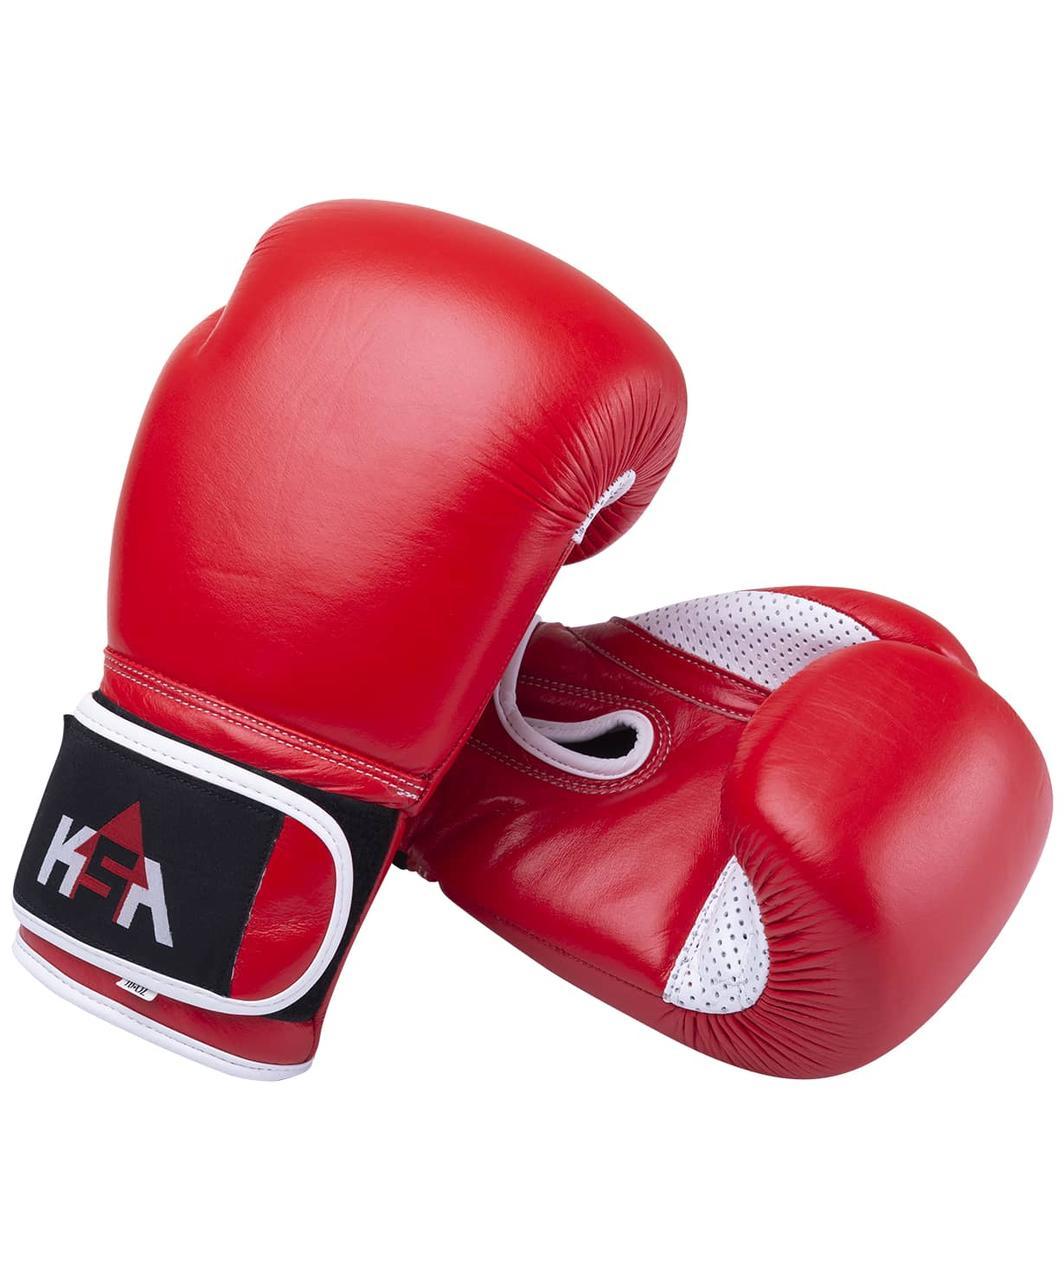 Перчатки боксерские Wolf Red, кожа, 14 oz KSA